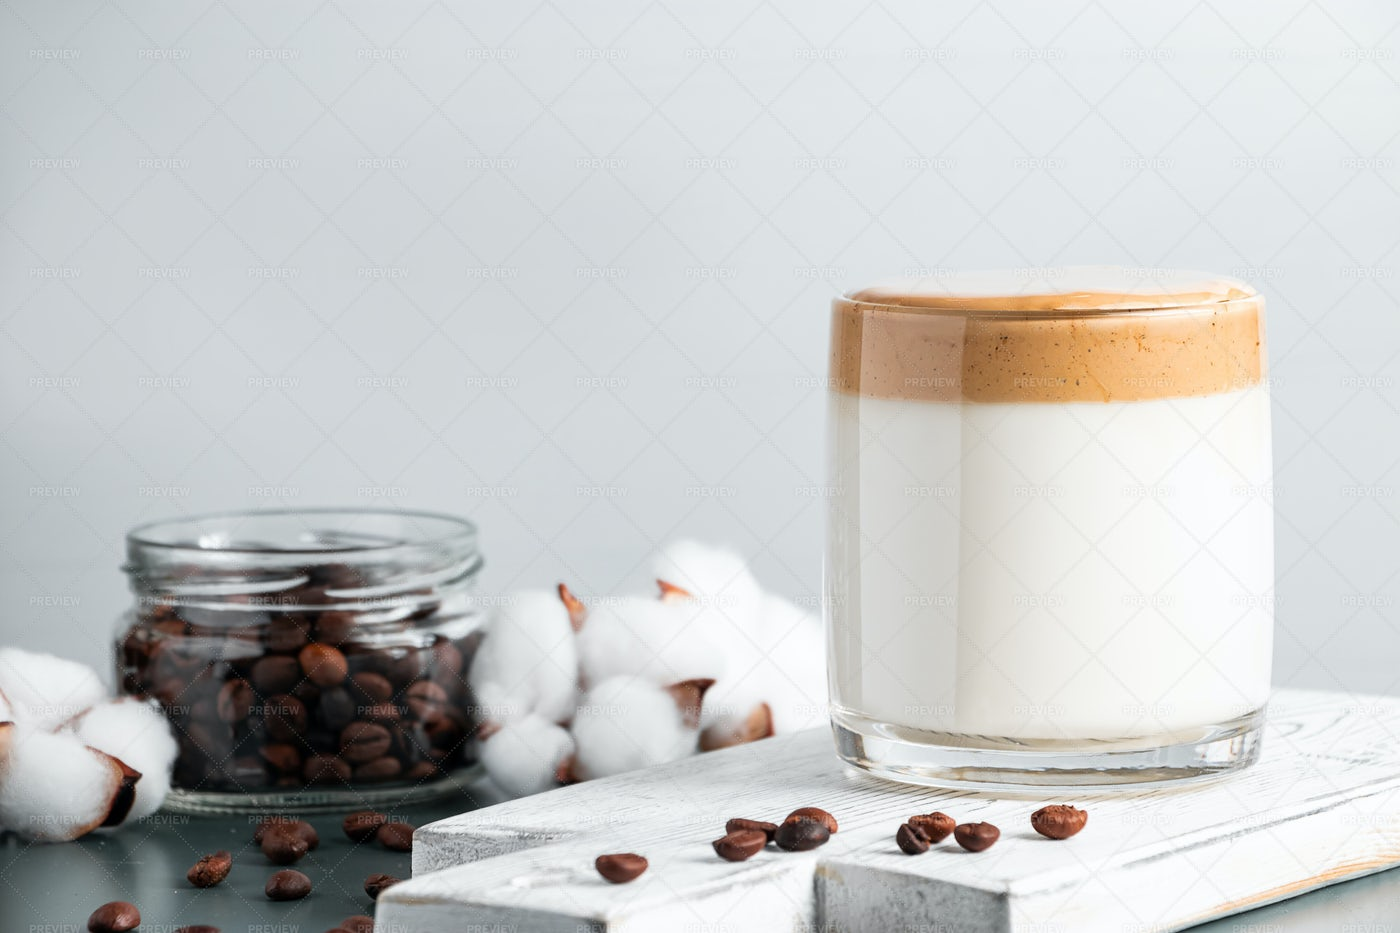 Iced Dalgona Coffee.: Stock Photos